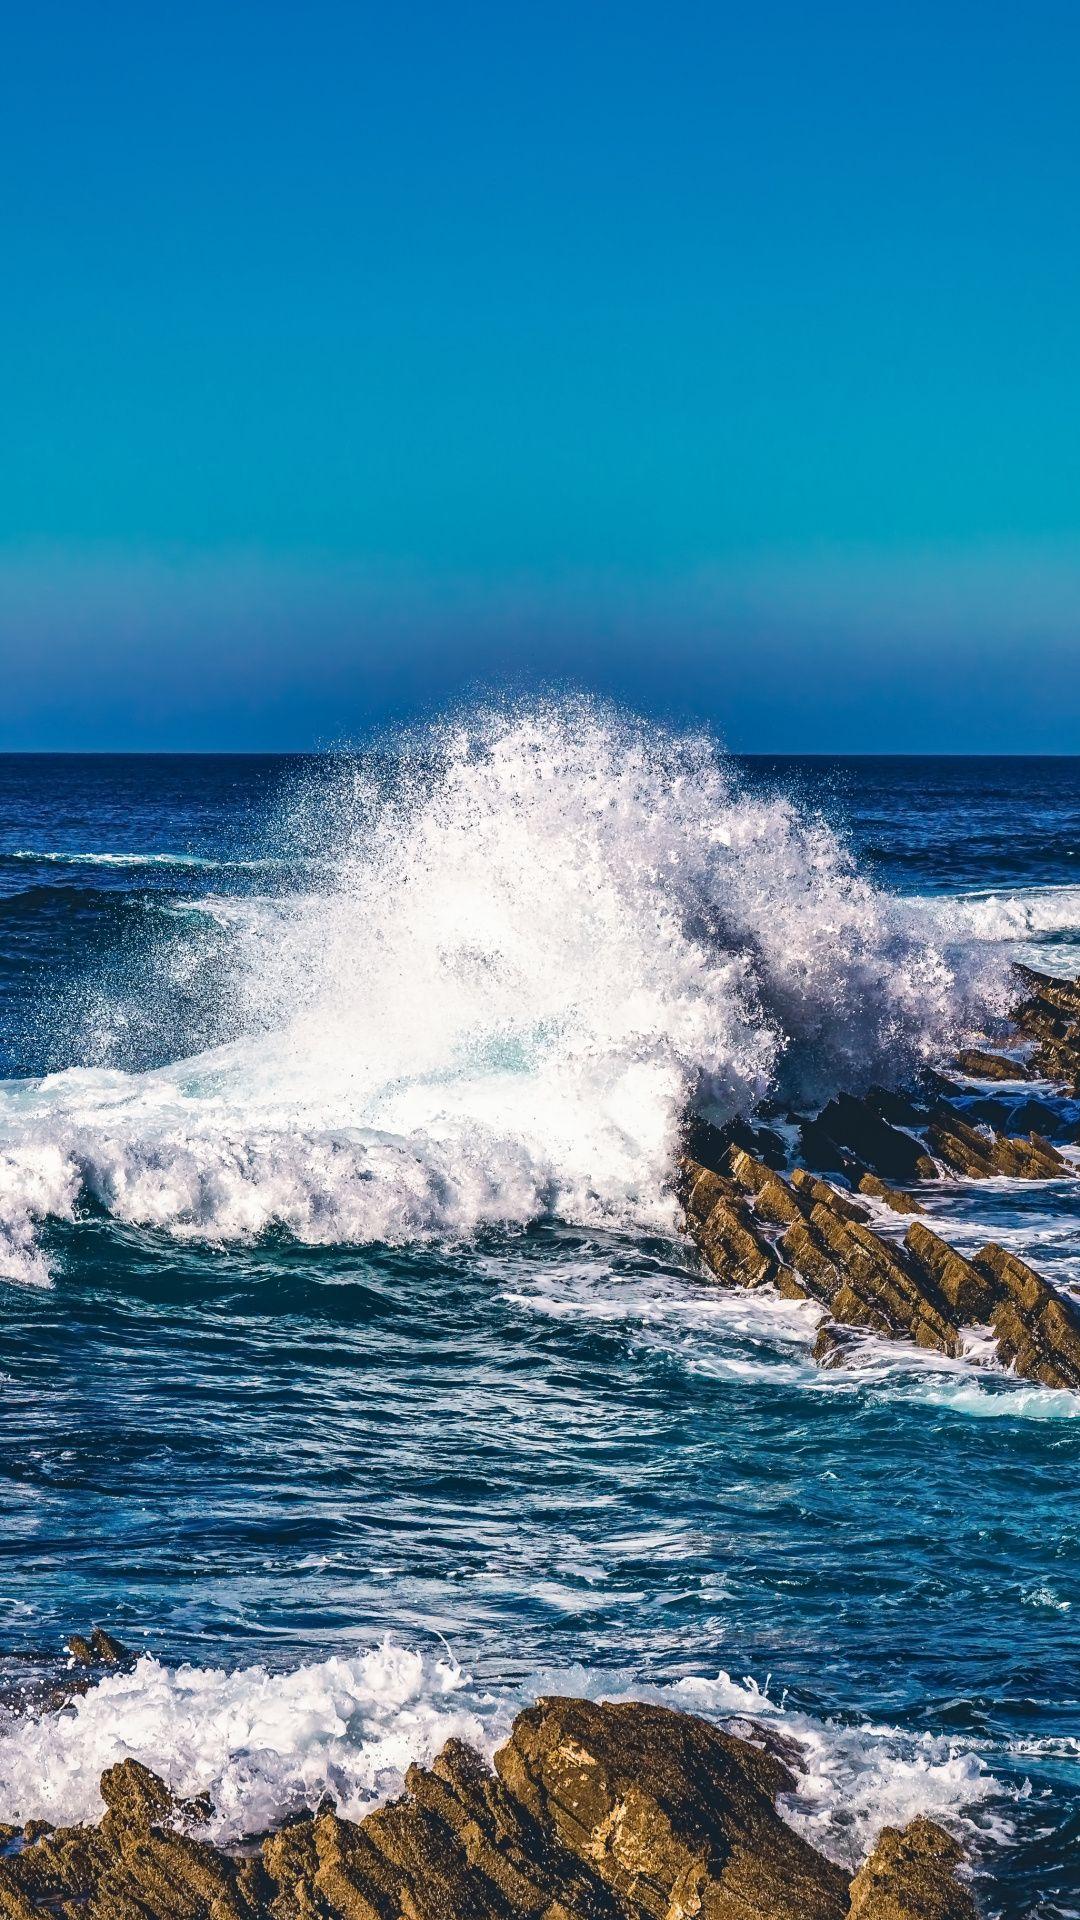 Water Splashes Sea Waves Coast Rocks Wallpaper Ocean Wallpaper Sea Waves Waves Wallpaper beach sea waves rocks coast